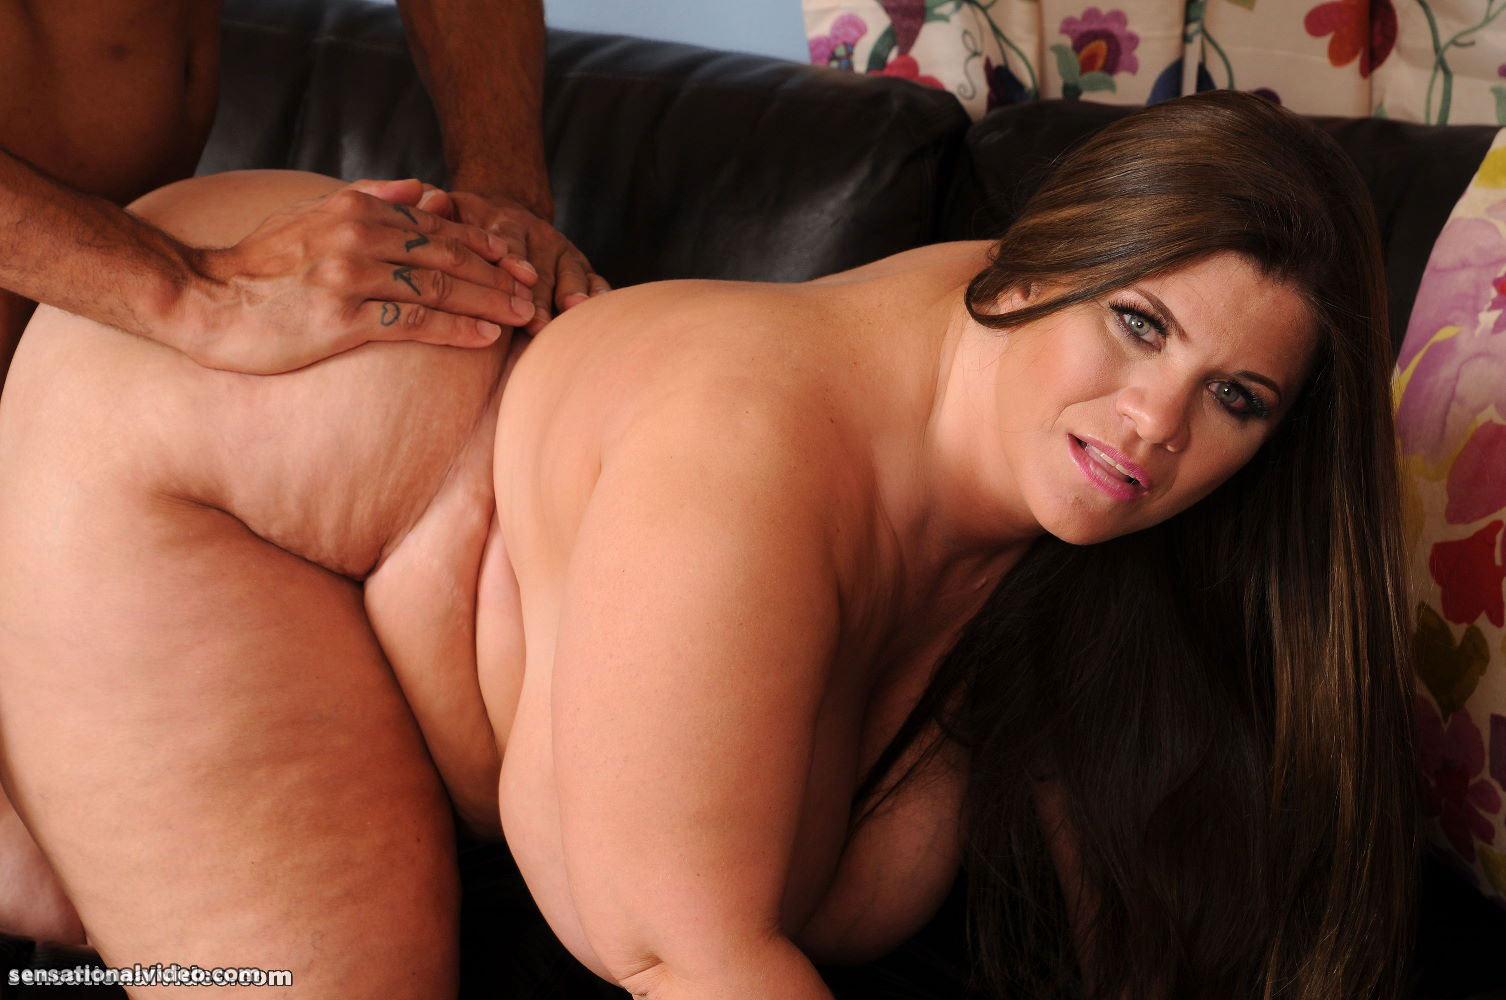 pics porno spreading asian pussy panties